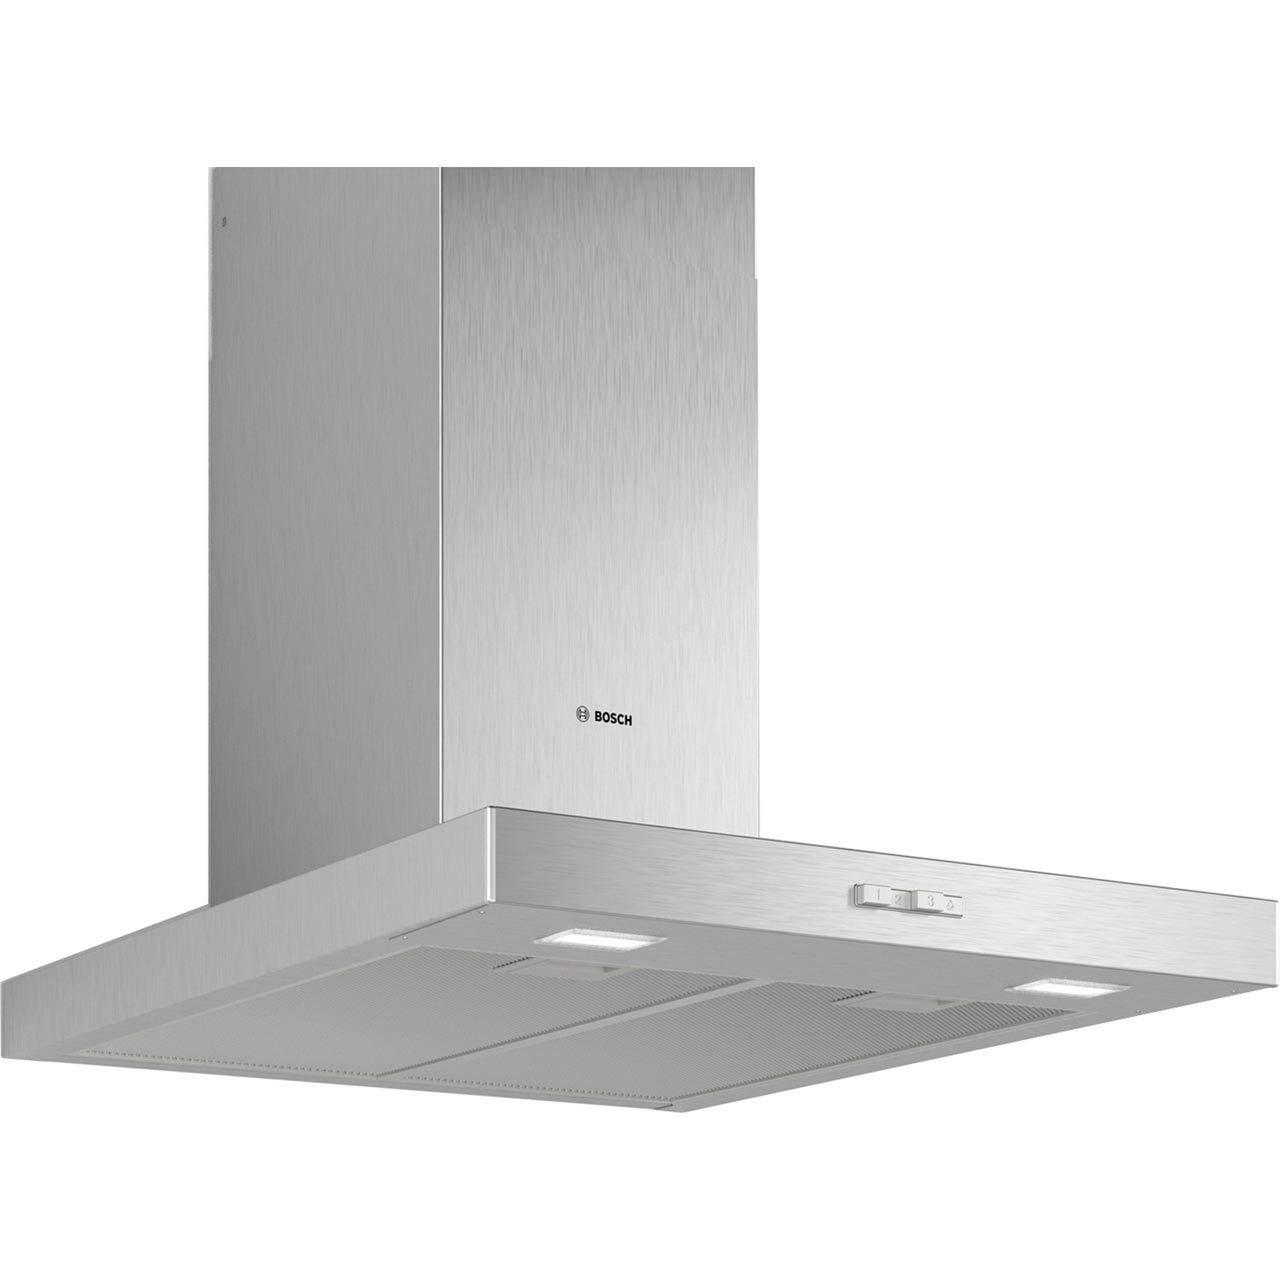 Bosch DWB64BC50B Serie 2 - Campana de cocina plana (60 cm, acero inoxidable): Amazon.es: Hogar